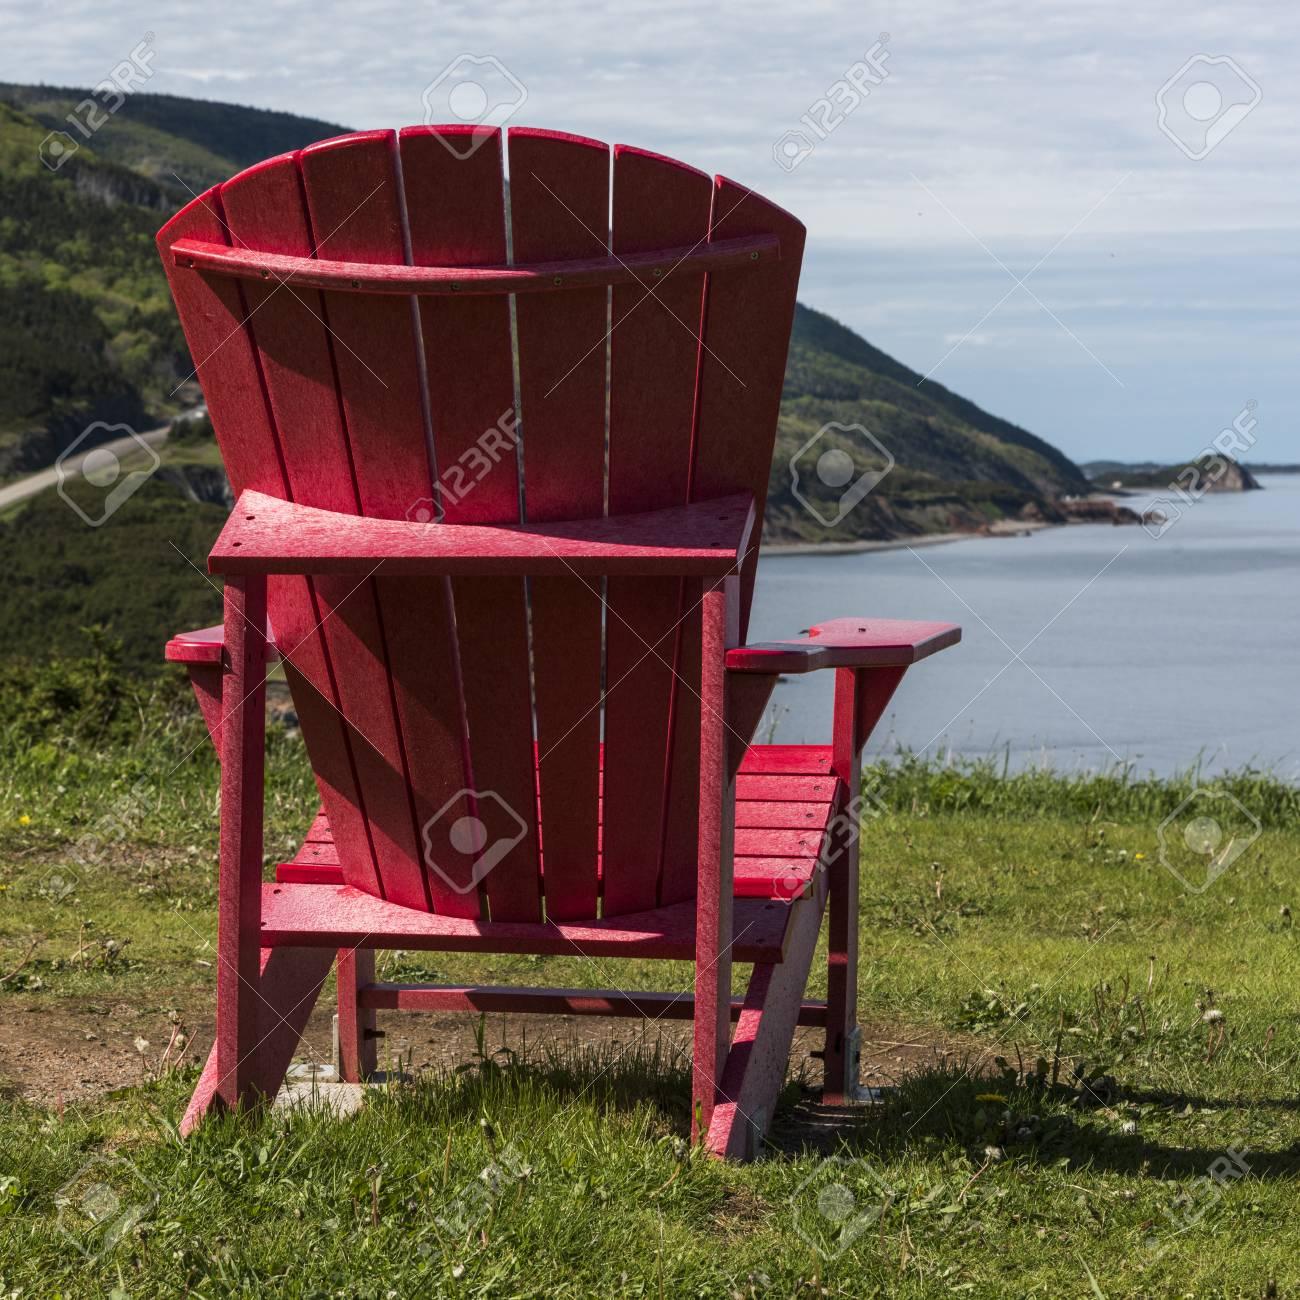 adirondack-stuhl an der küste, petit etang, kap-breton-hochland